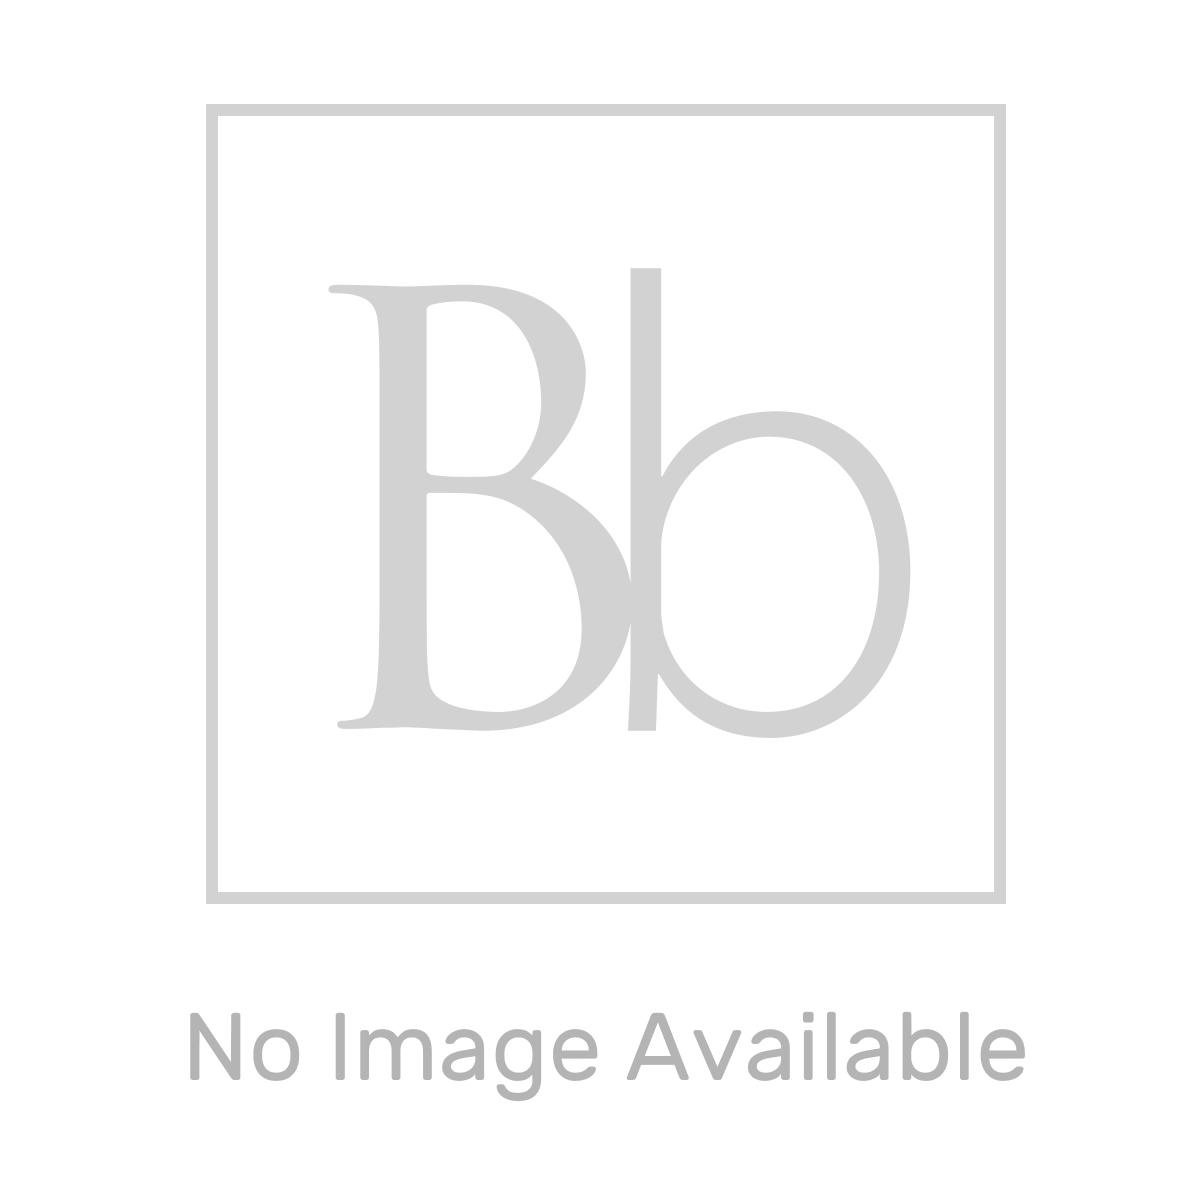 Rak Compact Wall Hung 1 Tap Hole Corner Basin Measurements